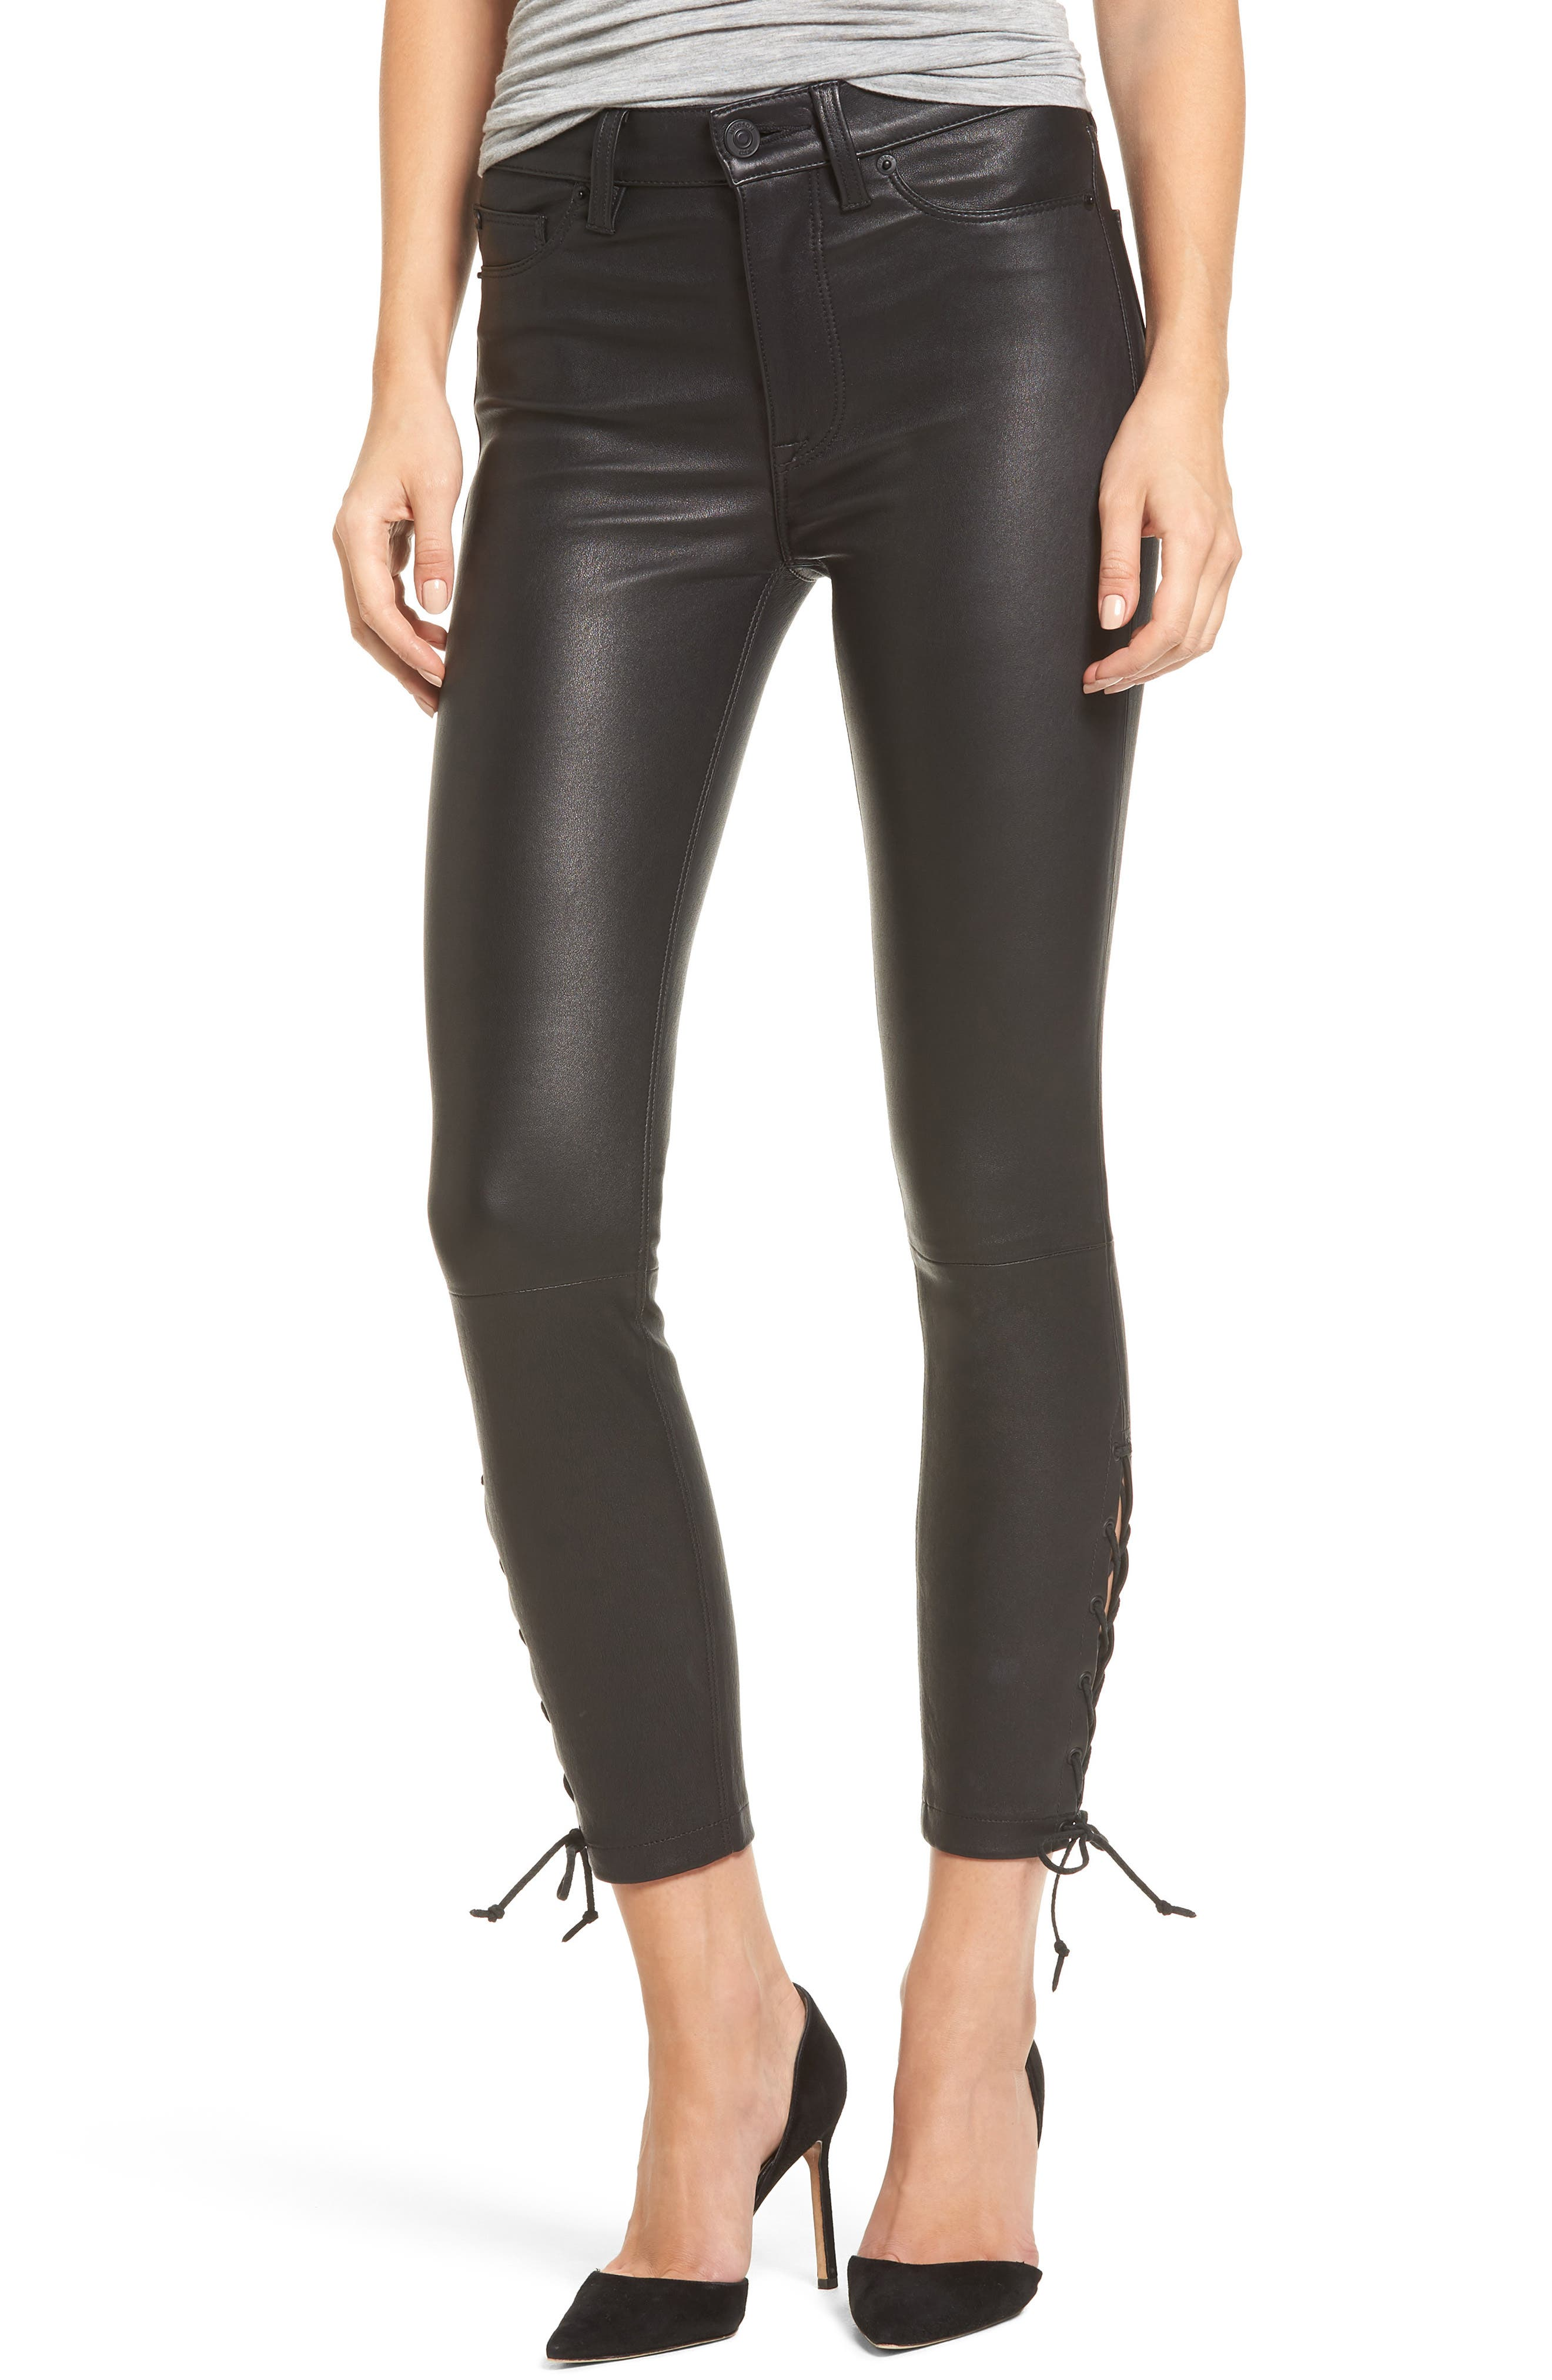 Nix High Waist Leather Skinny Pants,                         Main,                         color, BLACK